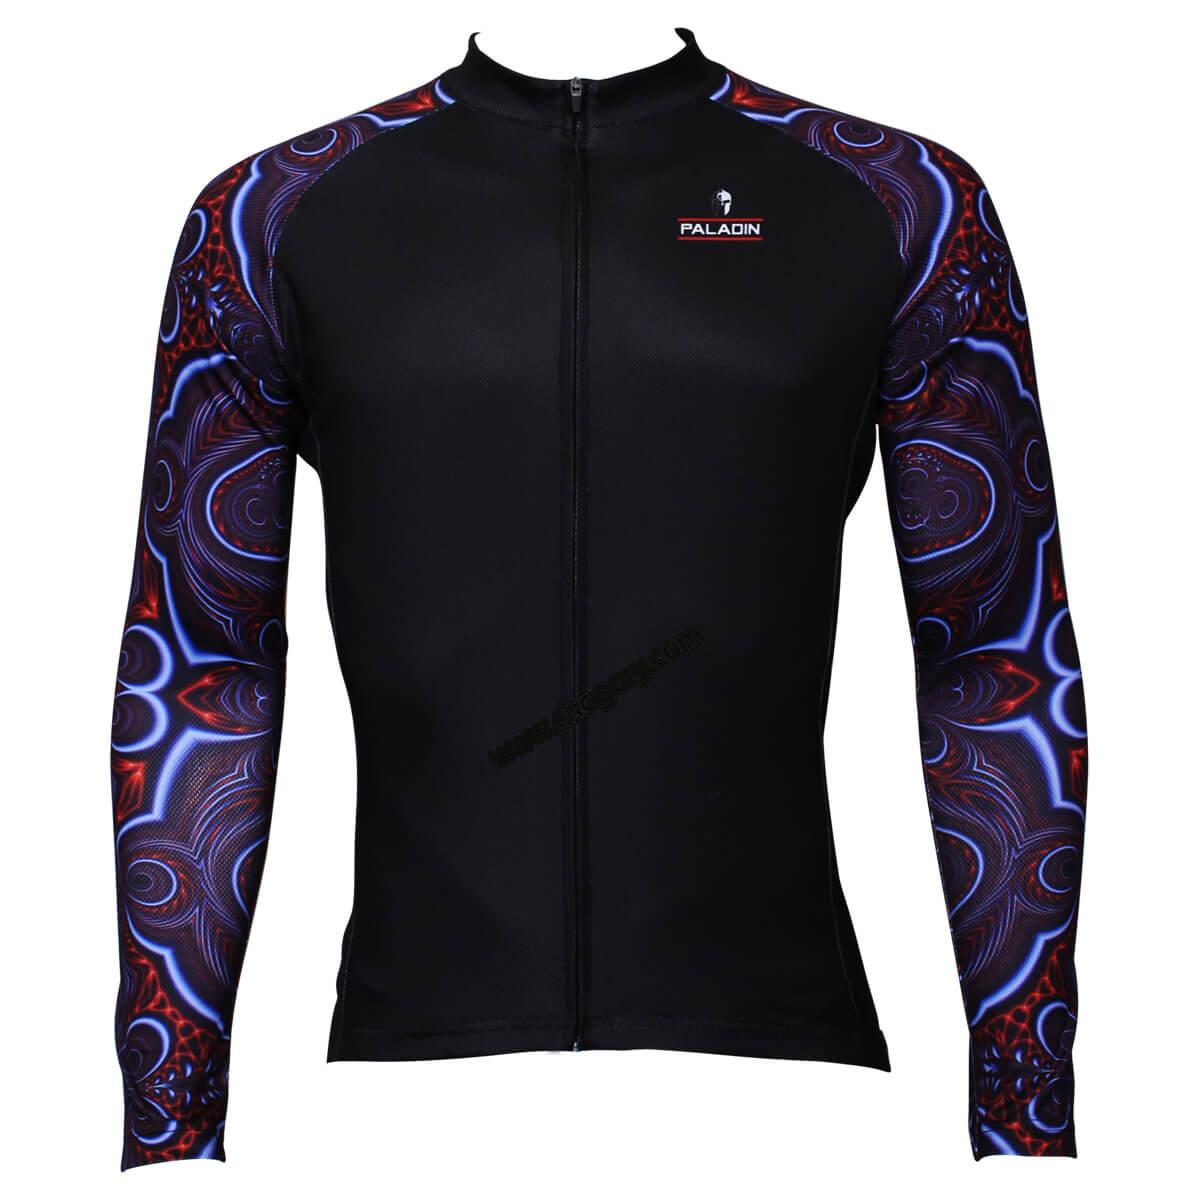 Kaleidoscope Sleeves Design Long Sleeve Bike Jerseys Chogory